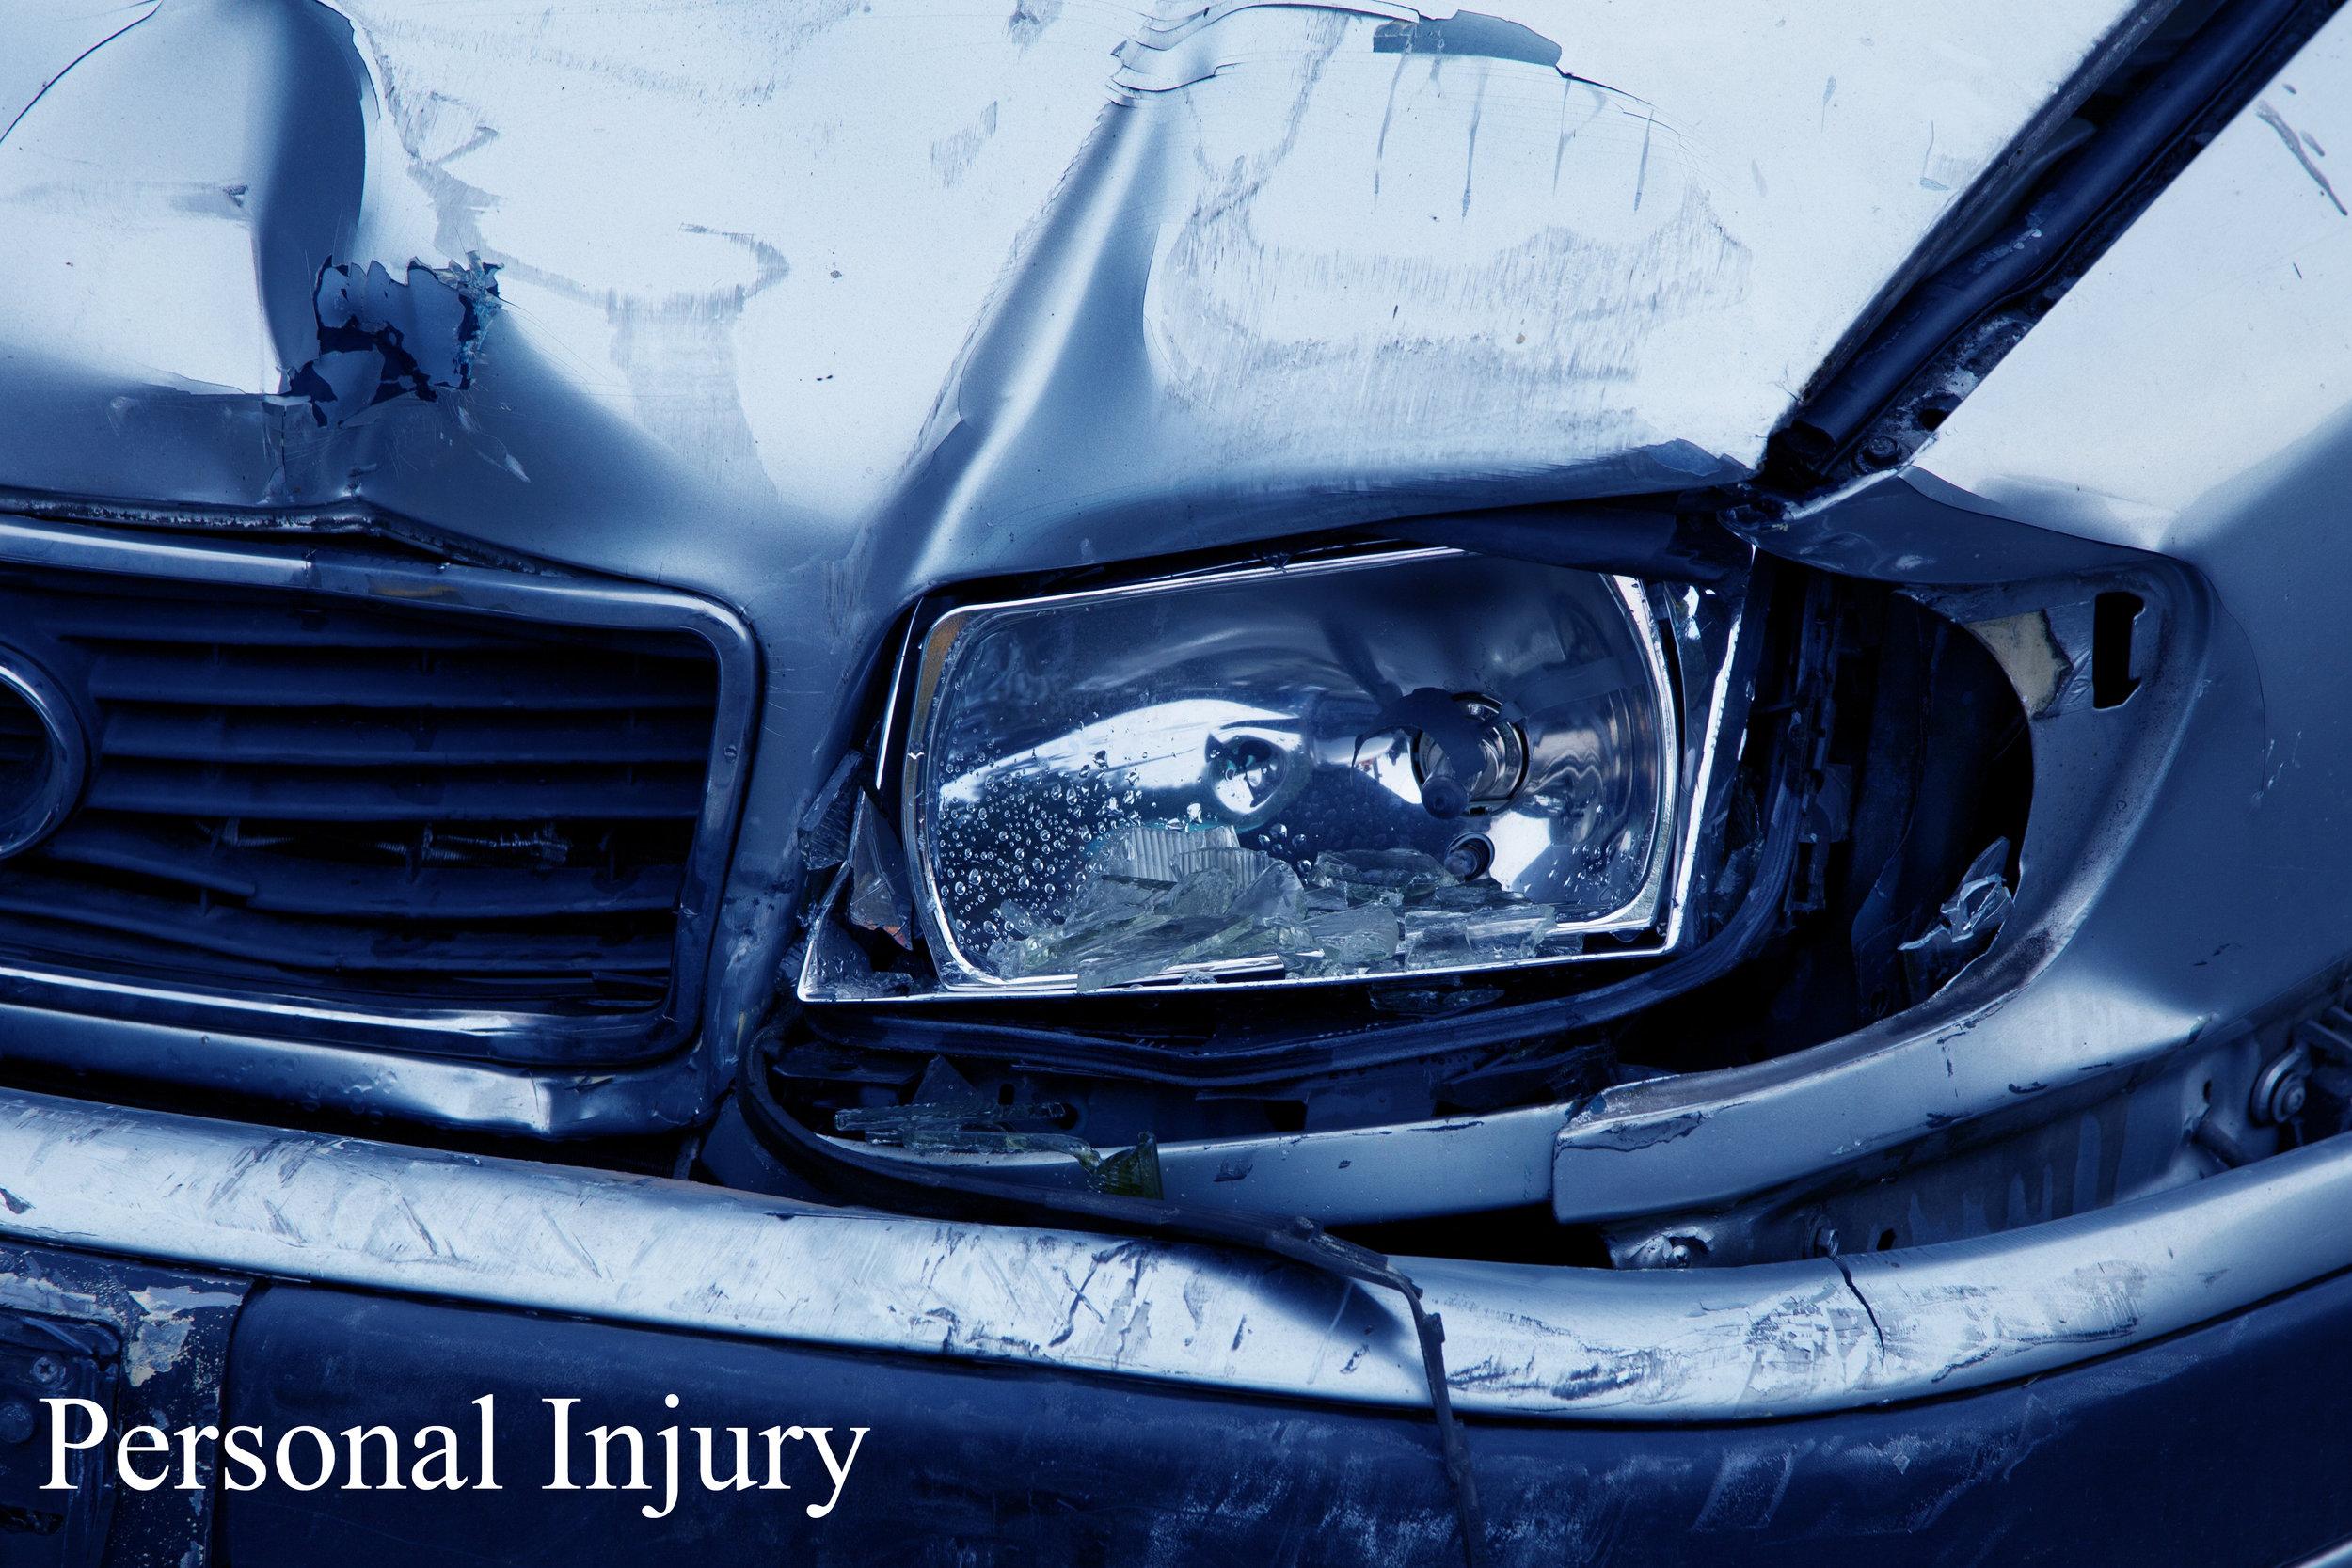 Personal Injury copy.jpg